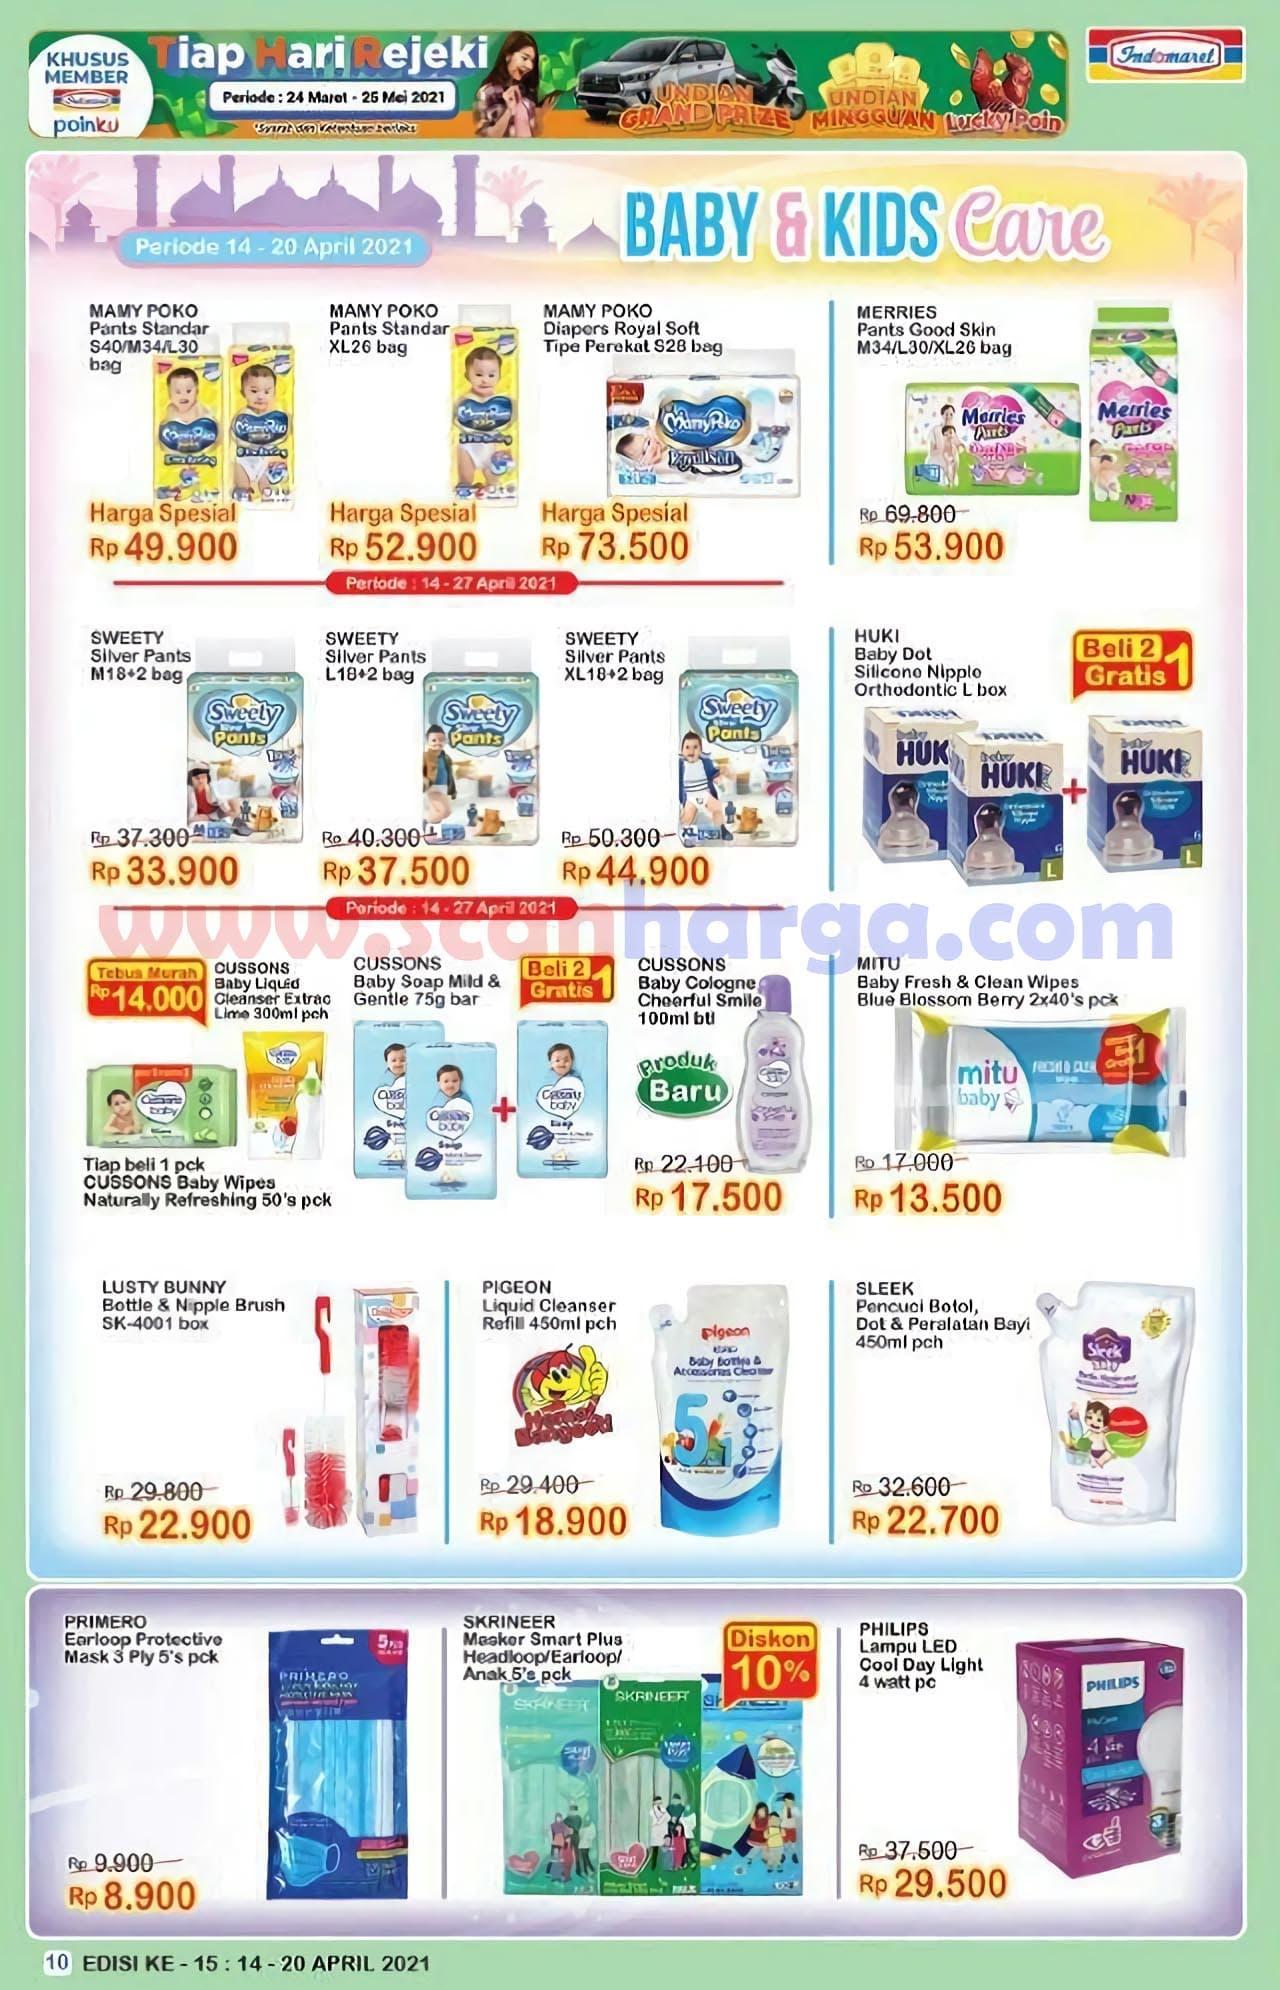 Katalog Indomaret Promo Terbaru 14 - 20 April 2021 10